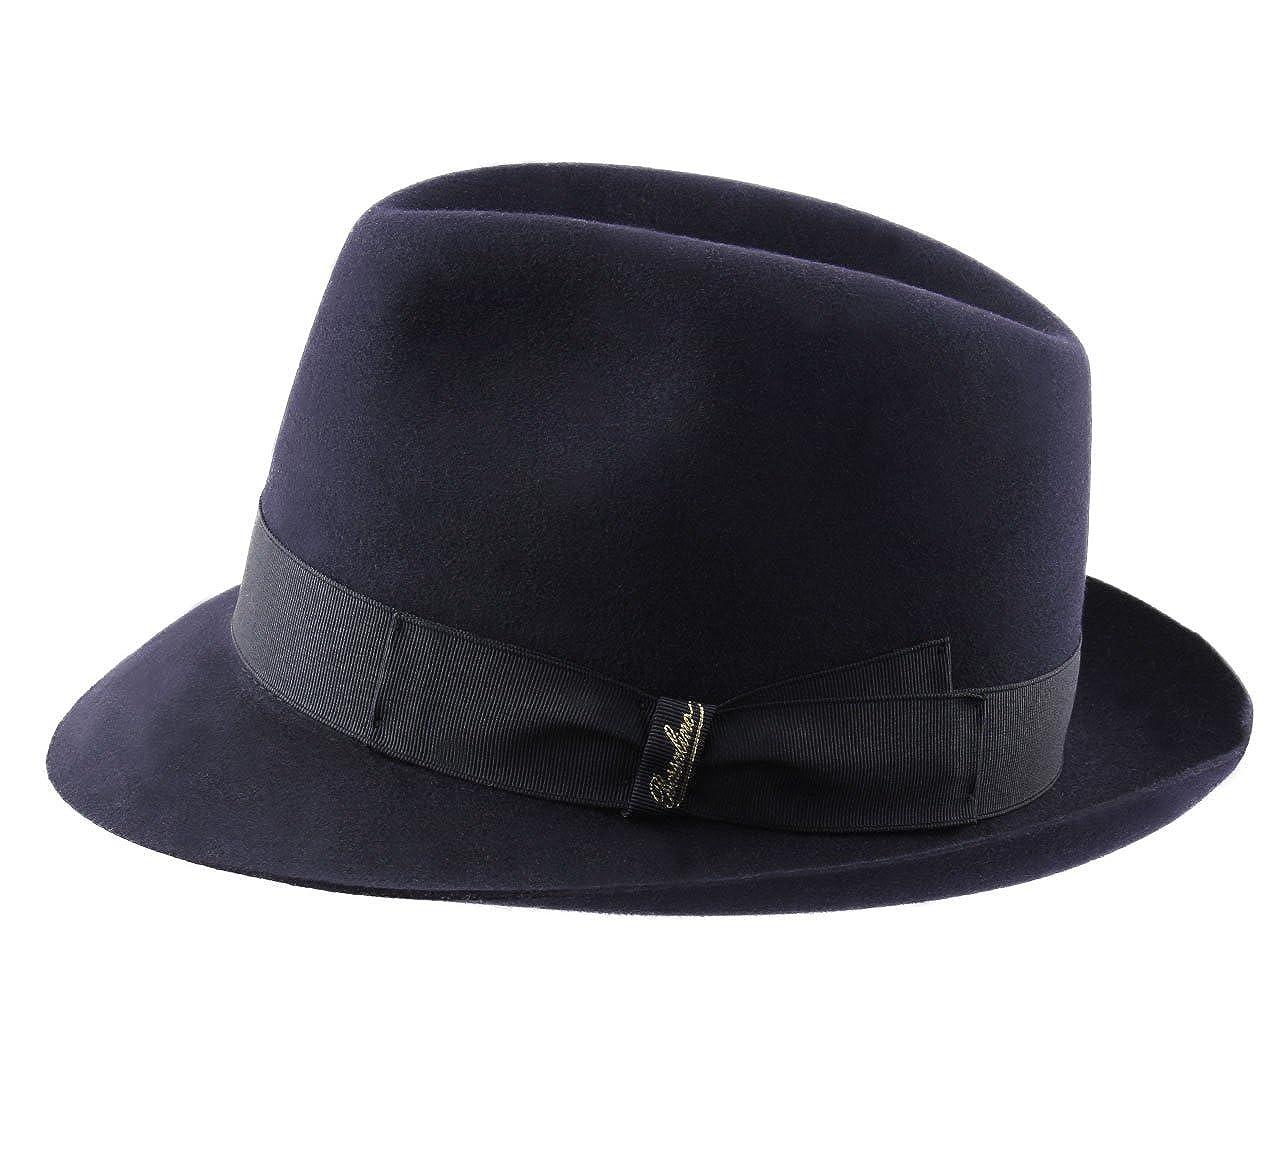 Borsalino Charlait Leather Trilby Hat